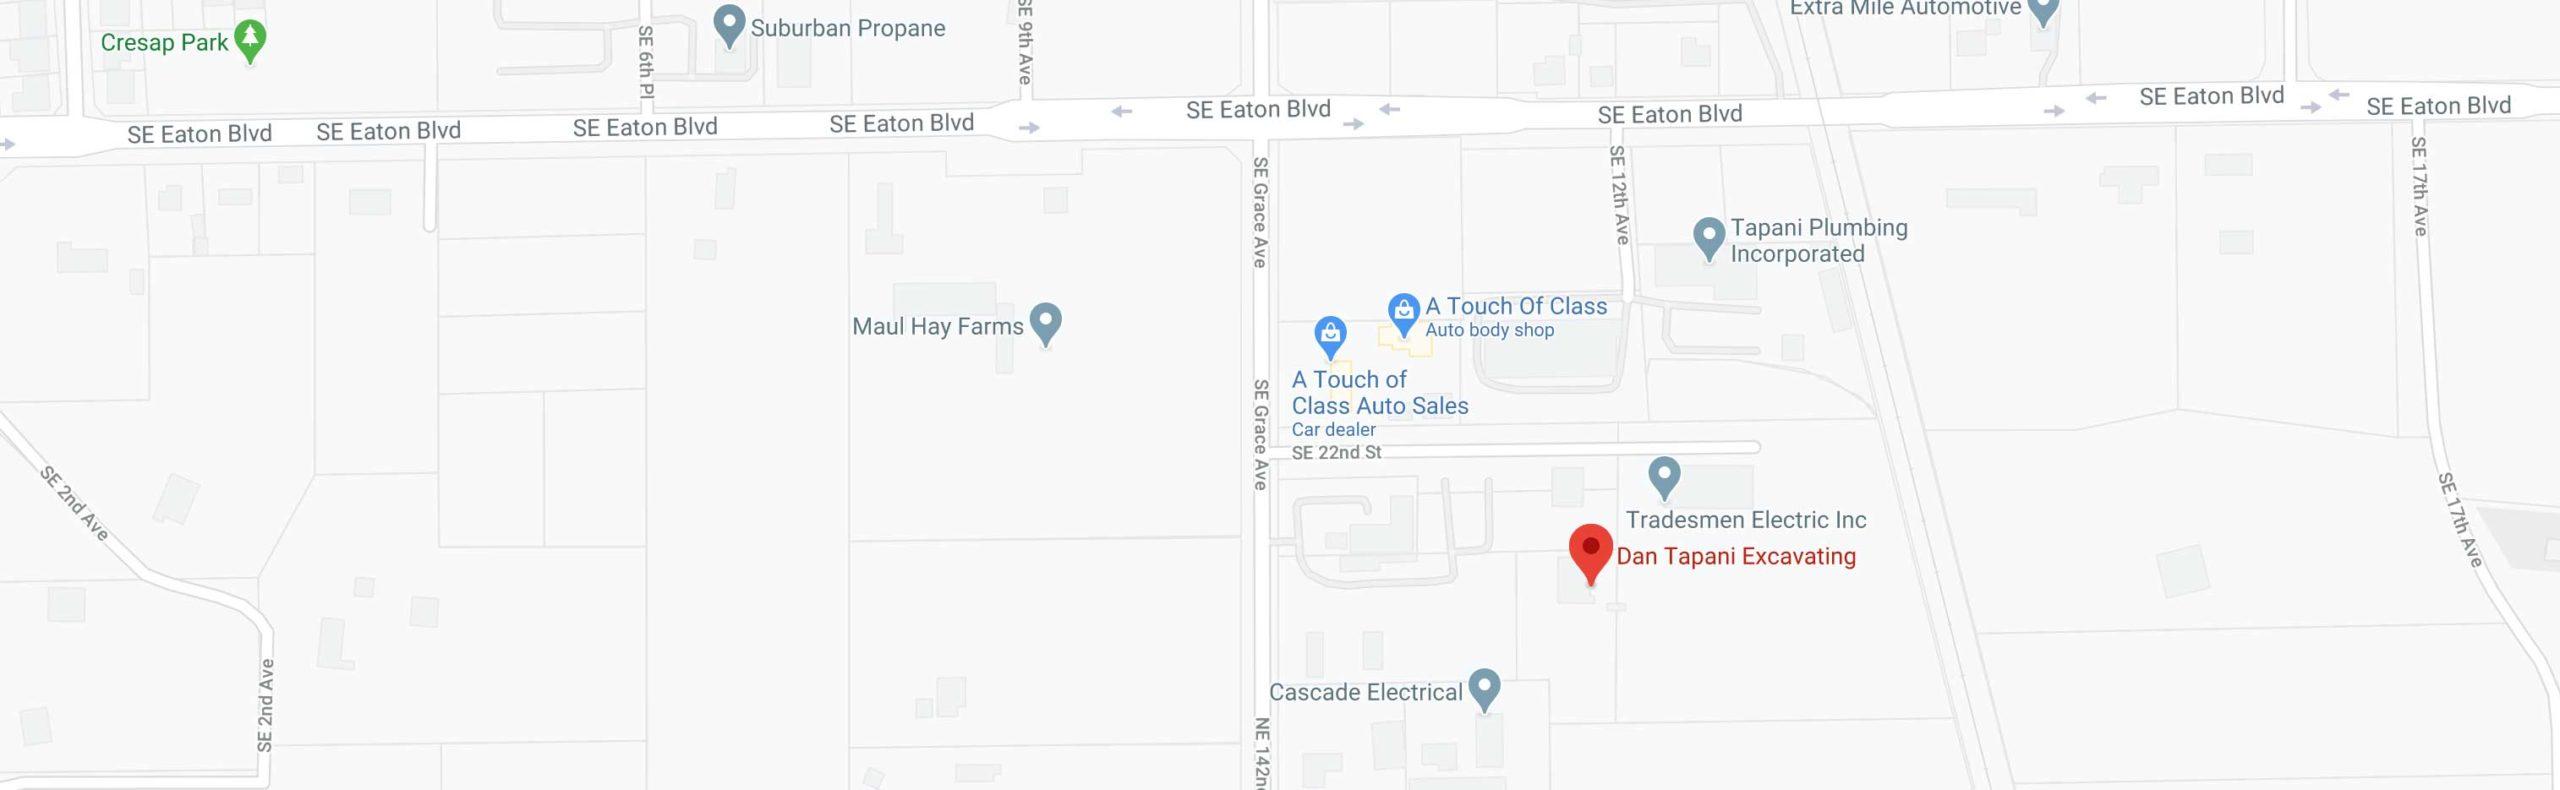 Dan Tapani Excavating Location on Google Maps